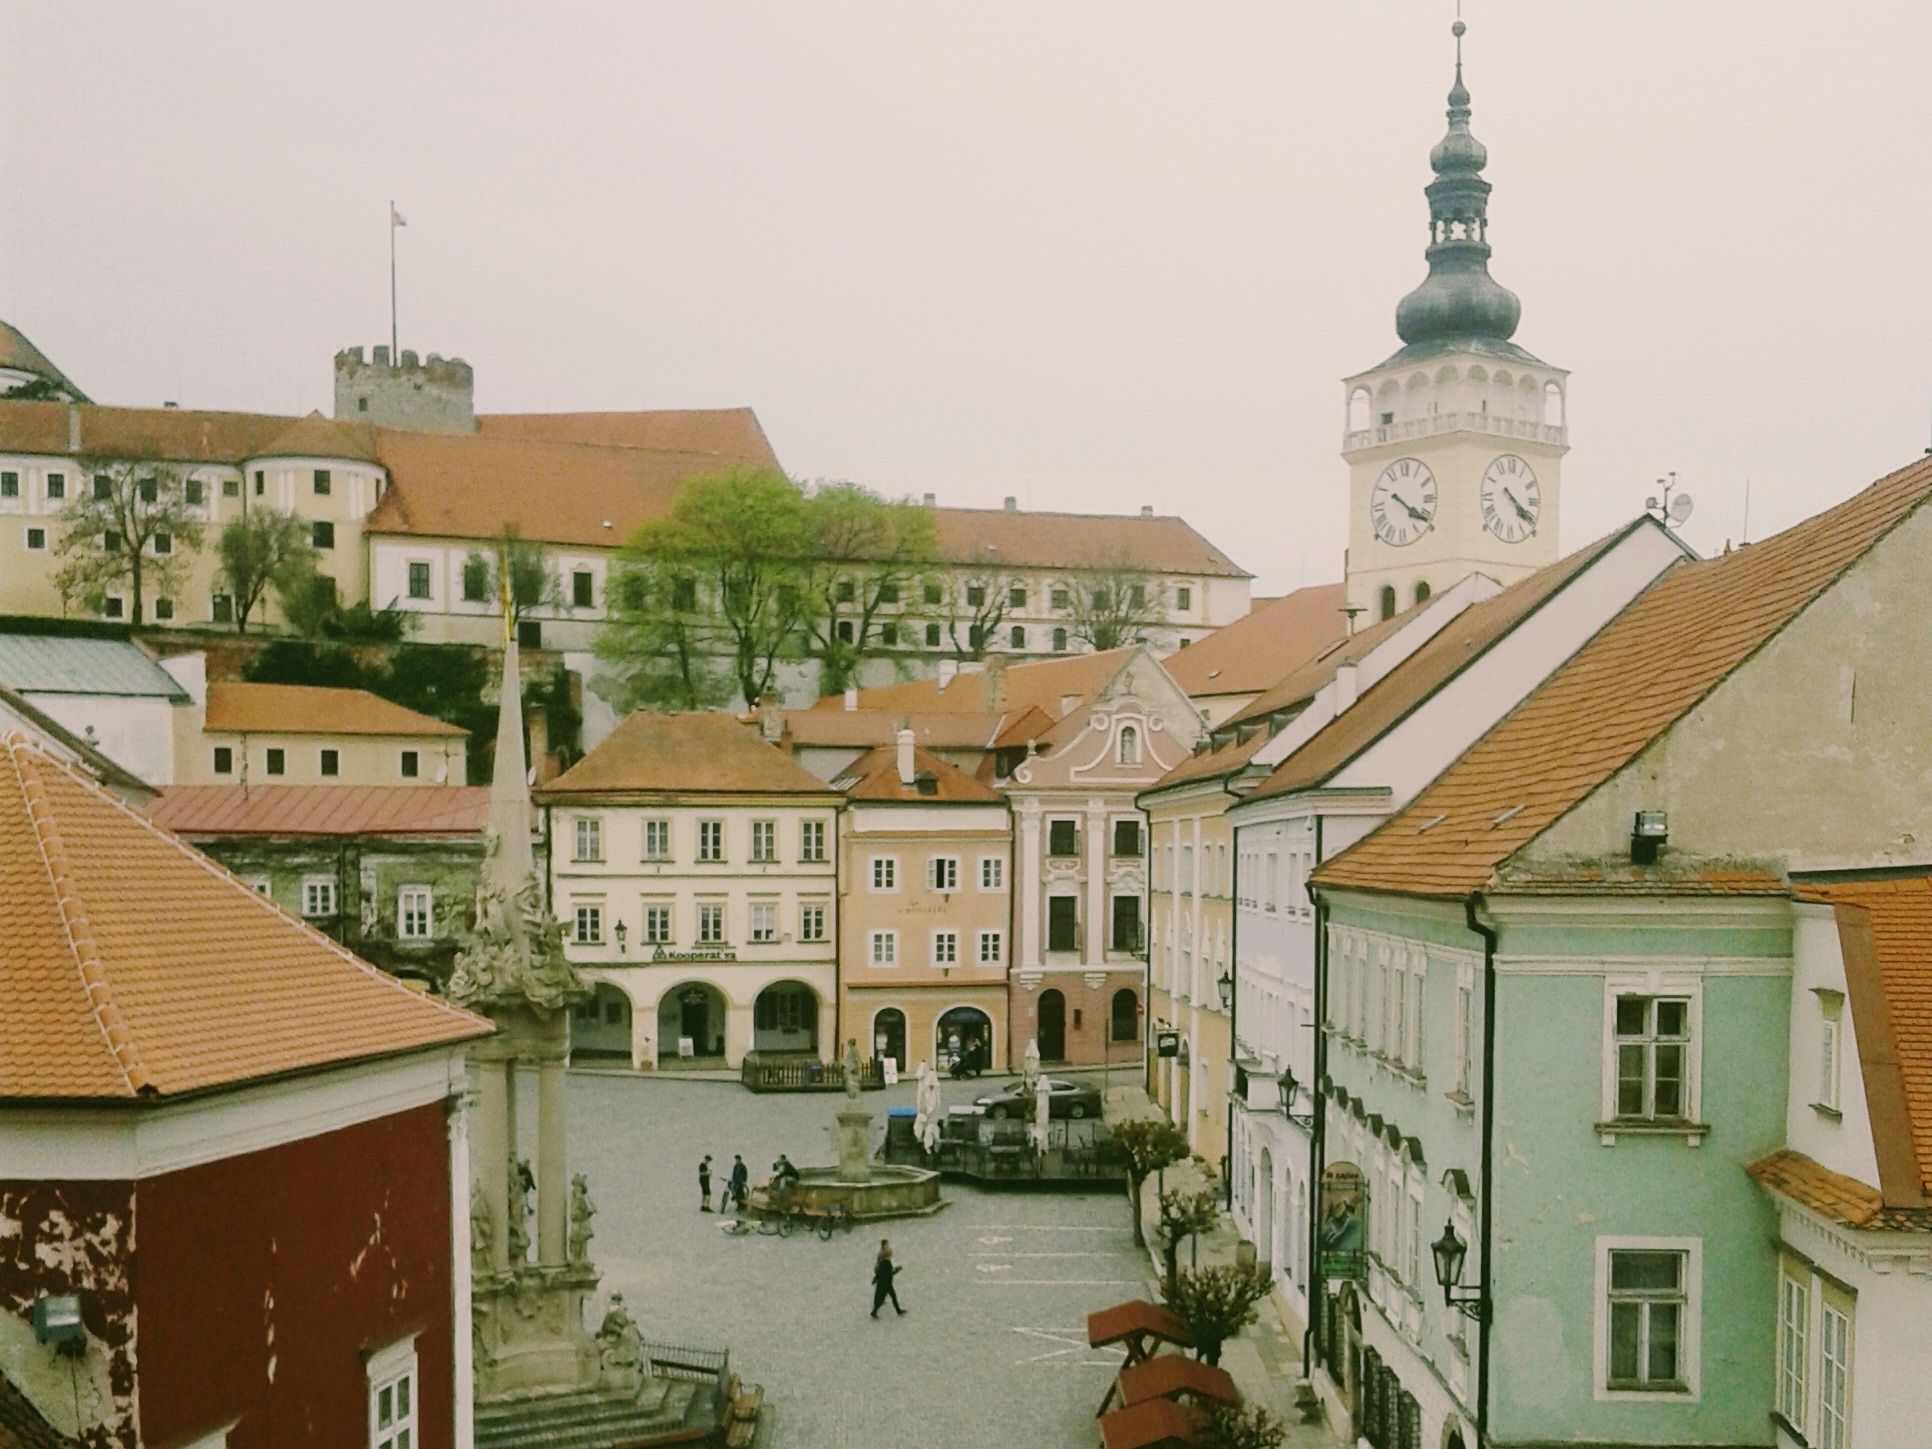 https://i.amy.gy/201804-slovakia-austria-czech/IMG_20180416_162120.jpg